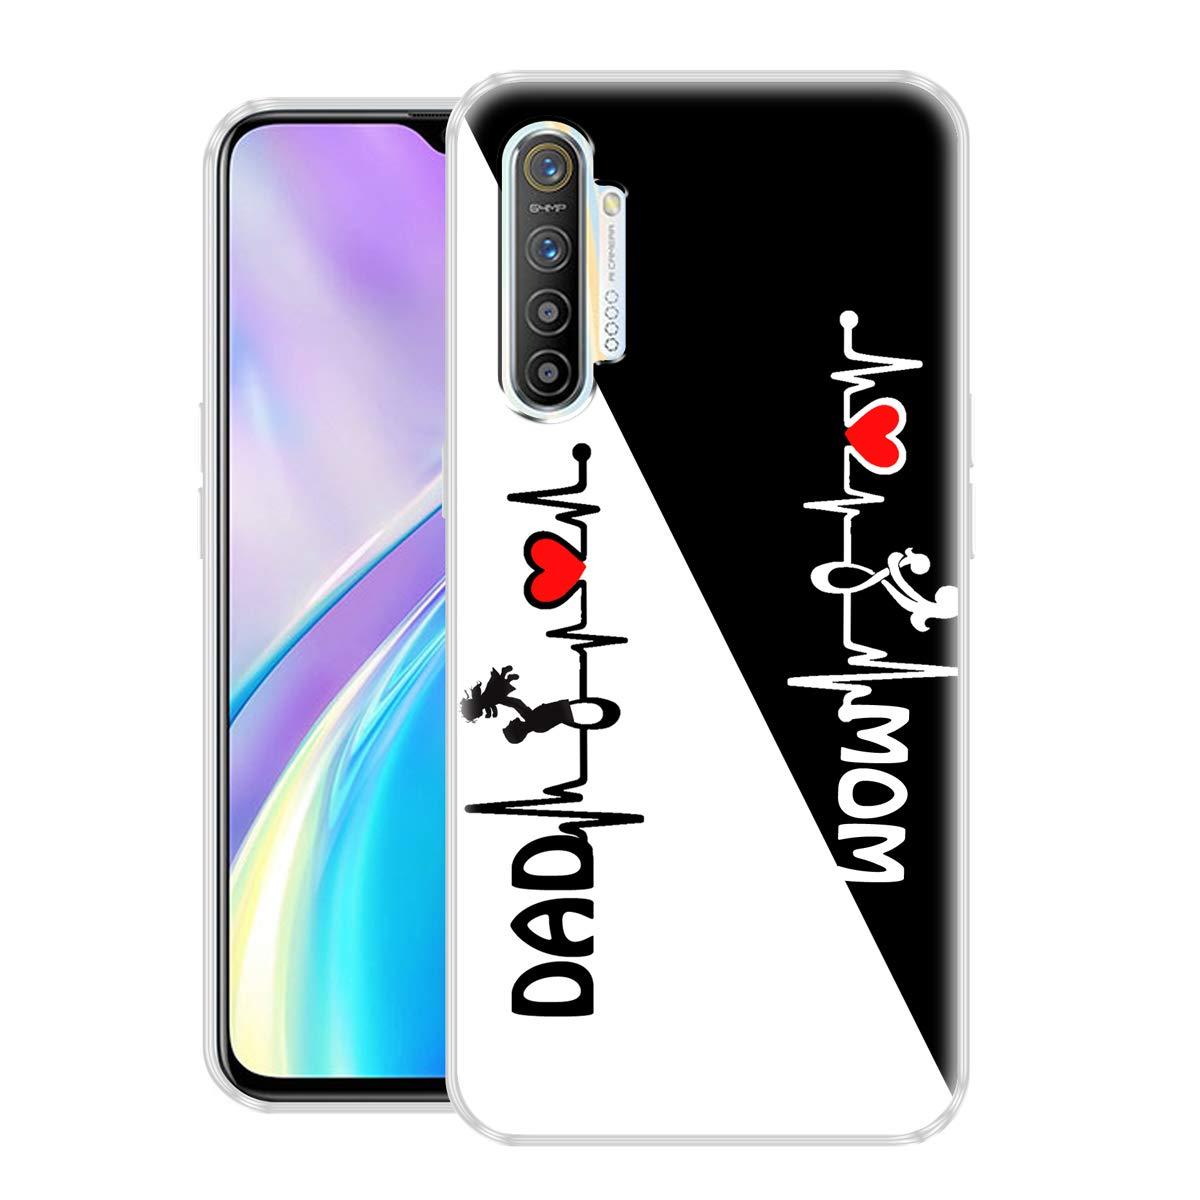 Nainz MOM & DAD Realme XT Printed Back Cover Case for Realme XT